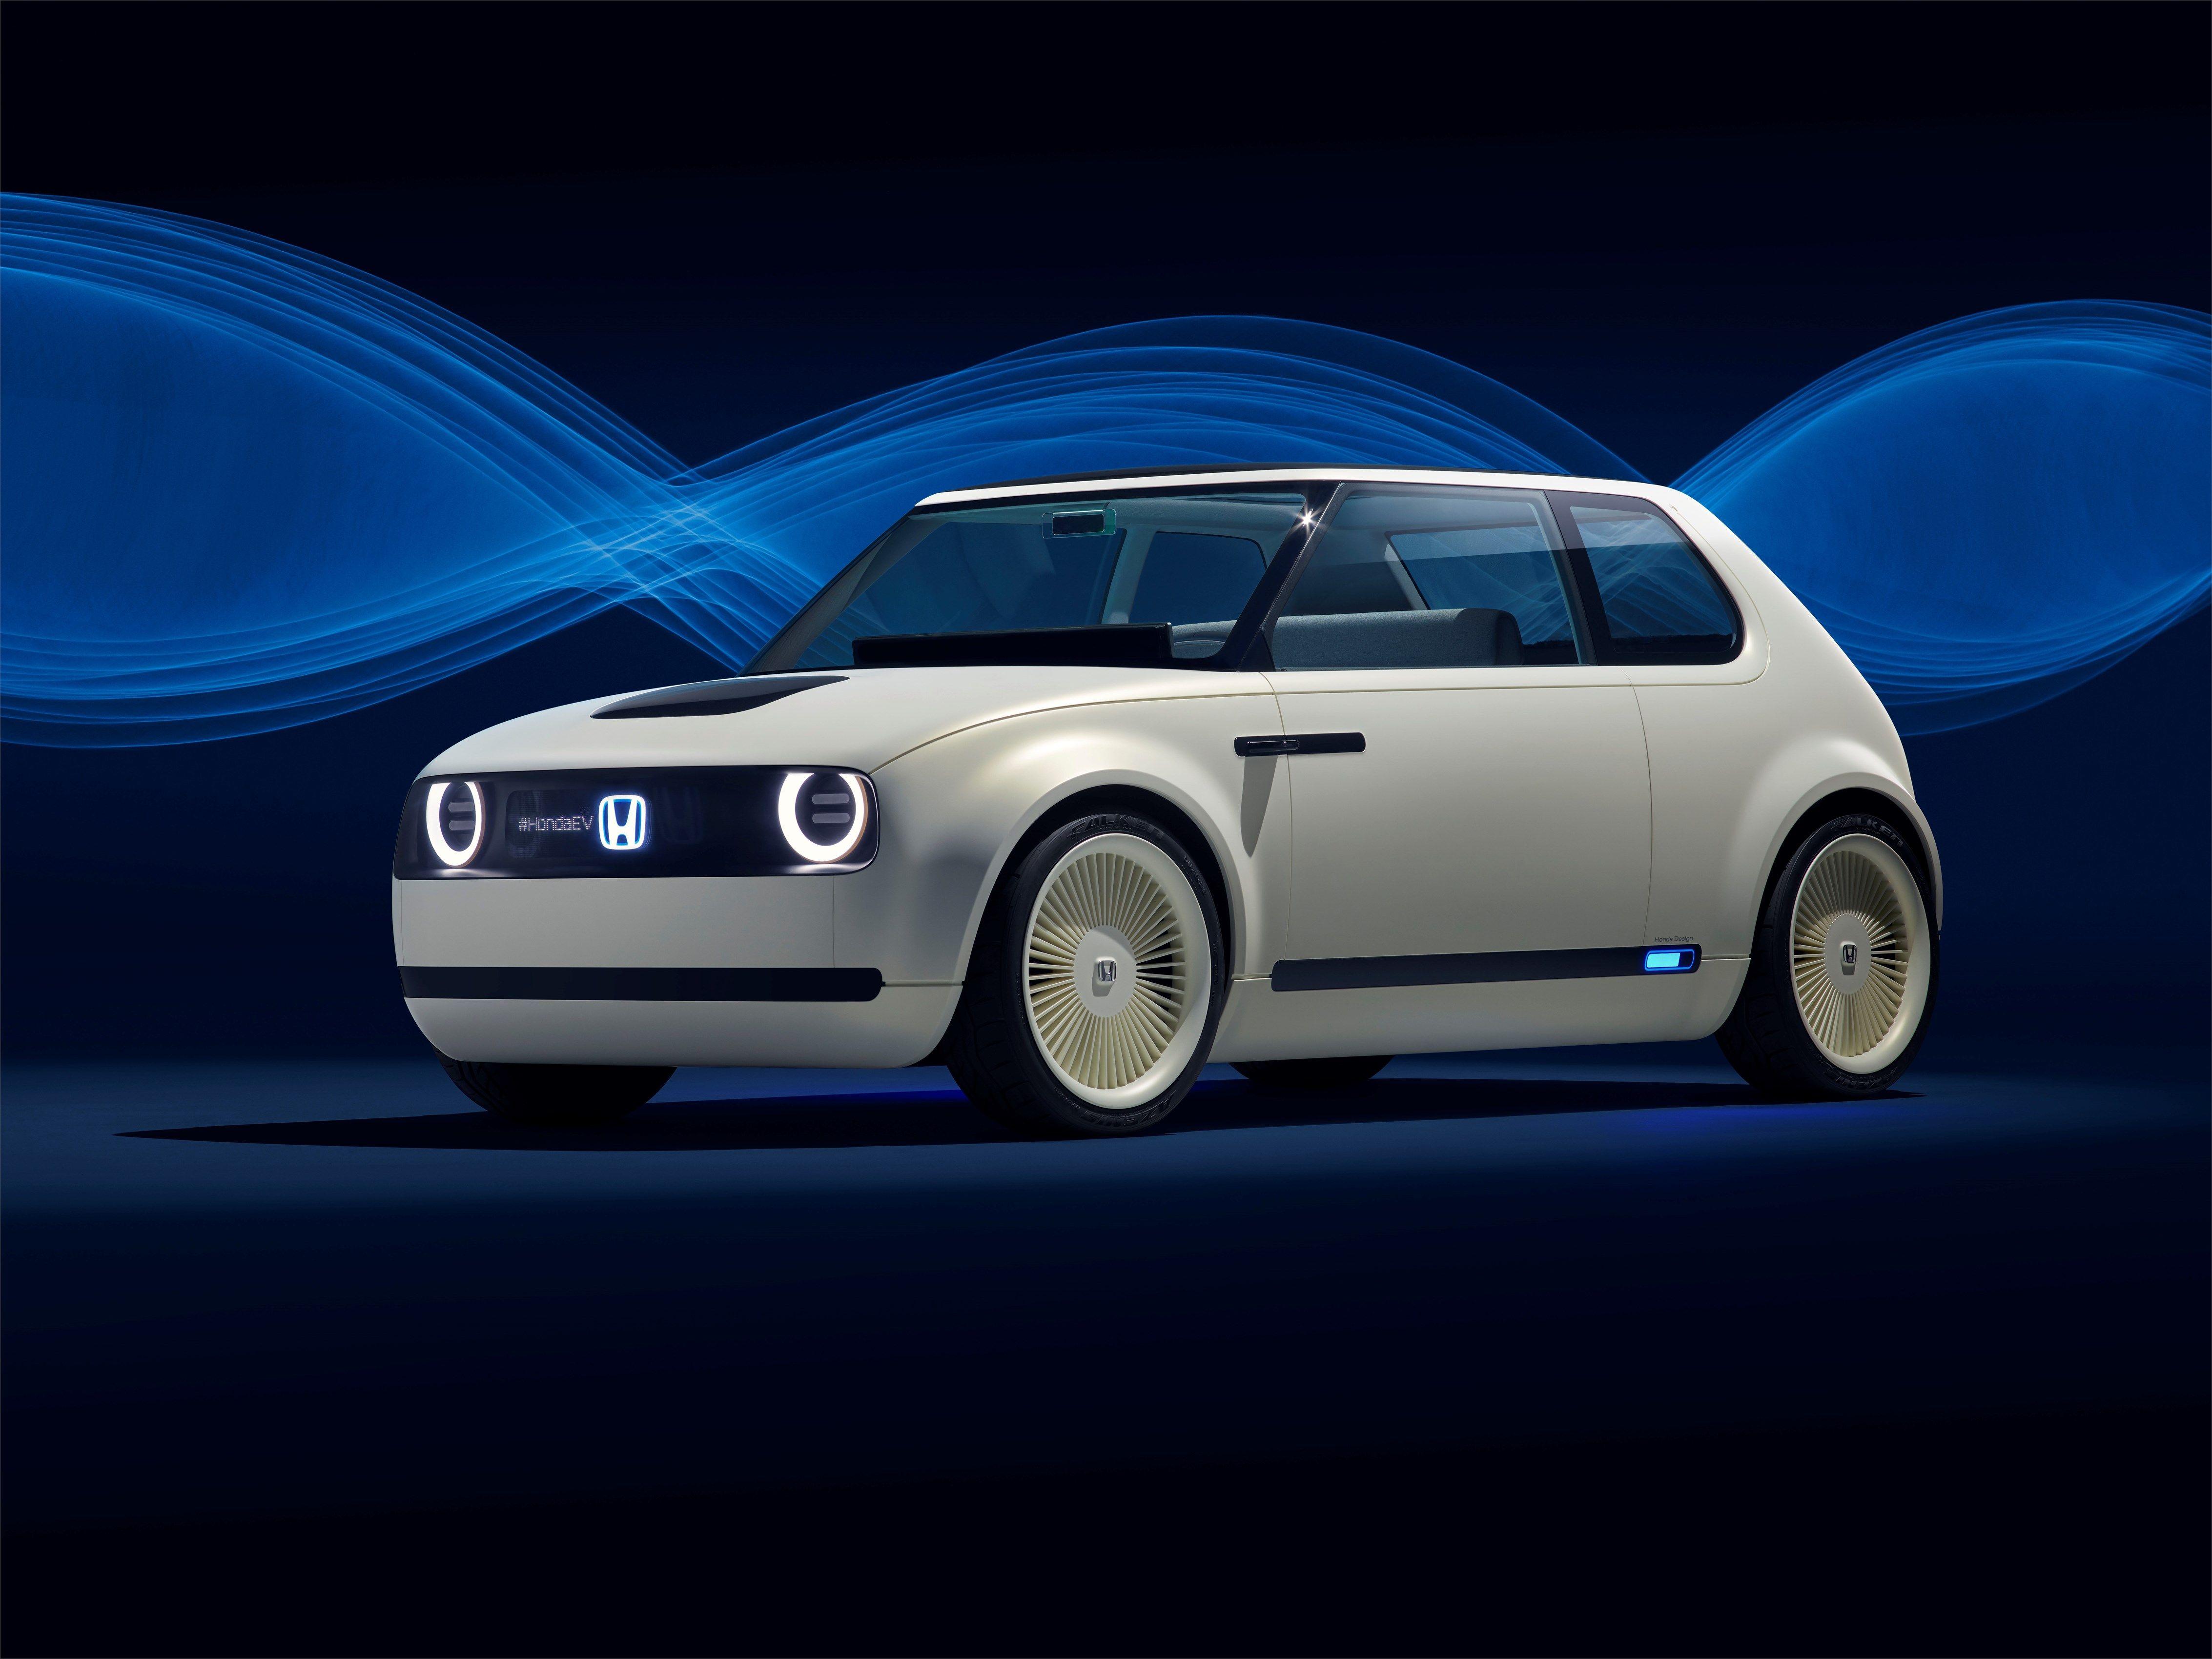 Honda S Picture Perfect Urban Ev Concept Car Aims For 2019